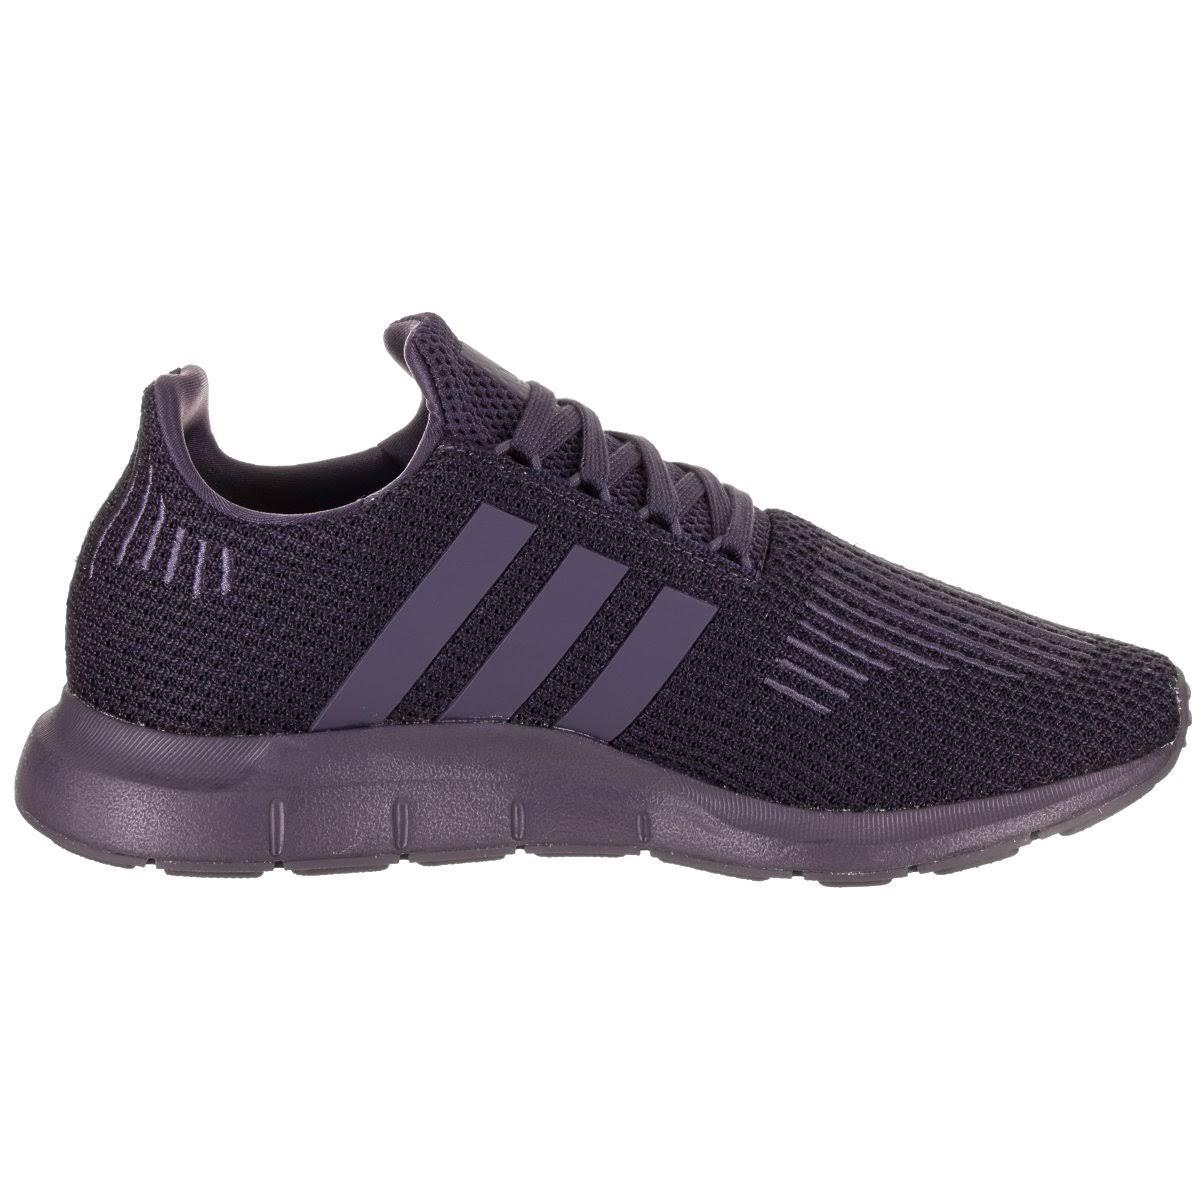 Adidas Swift RunDonna Swift Adidas RunDonna Adidas RunDonna Adidas RunDonna Swift Swift RunDonna Swift Adidas Adidas bgf7YI6vym